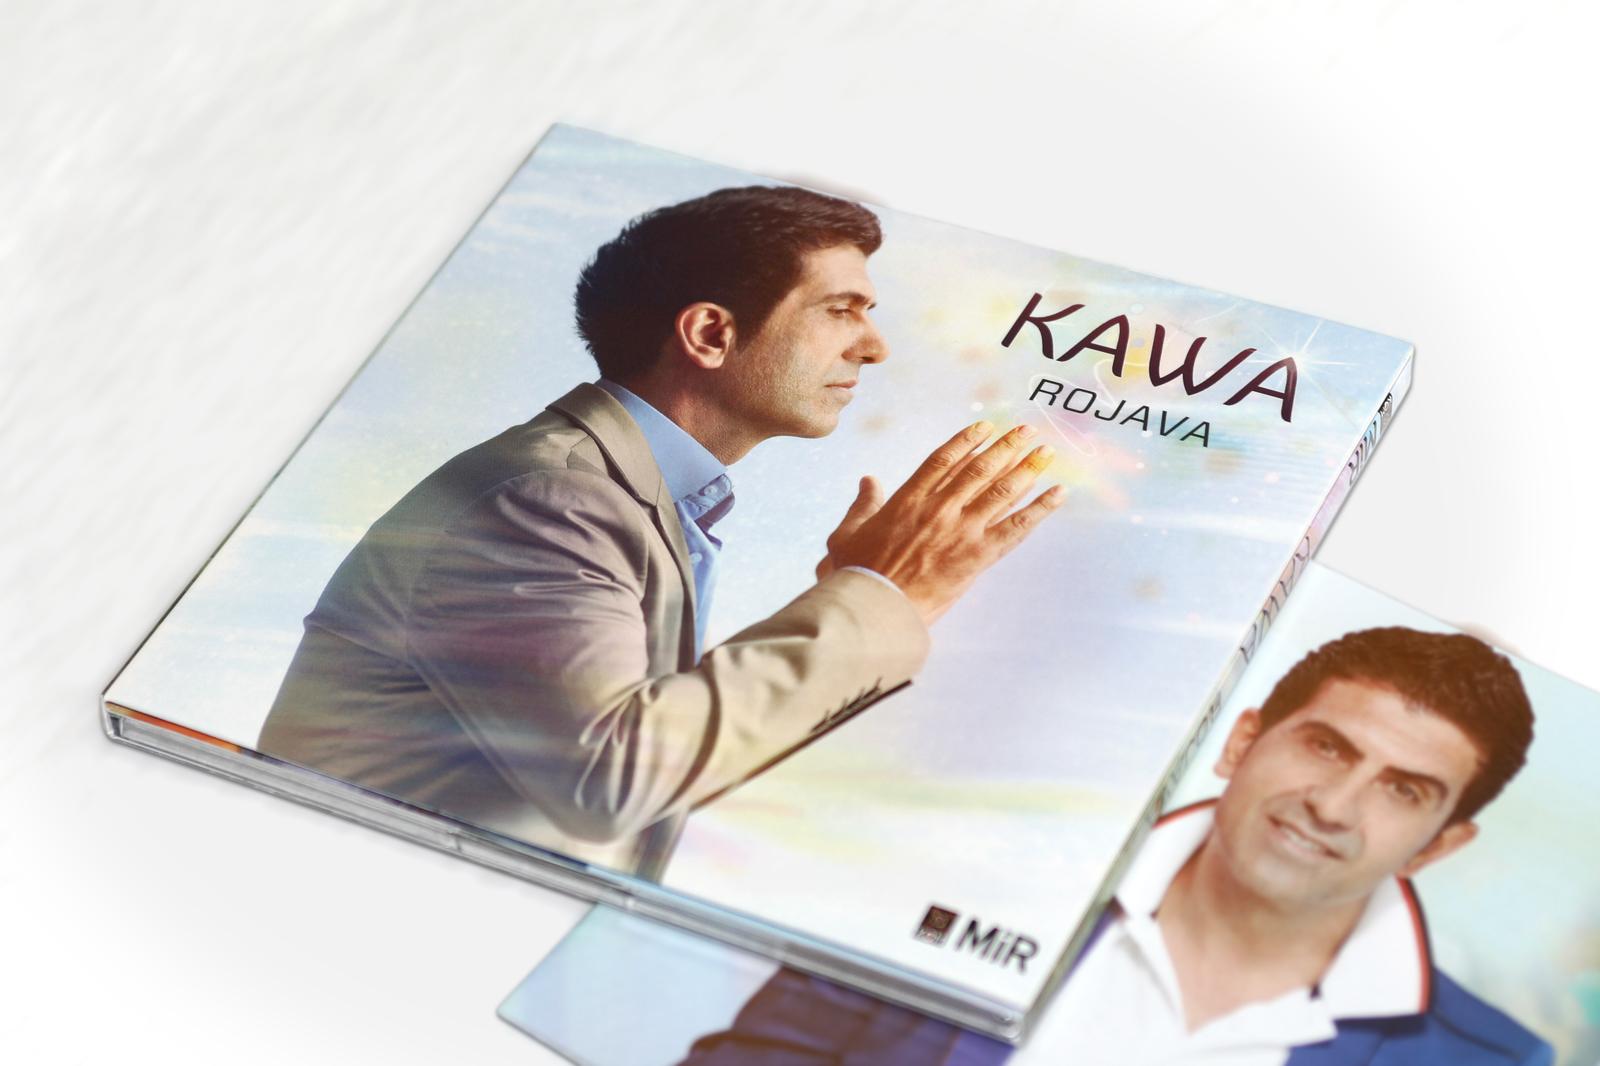 Musik CD Booklet